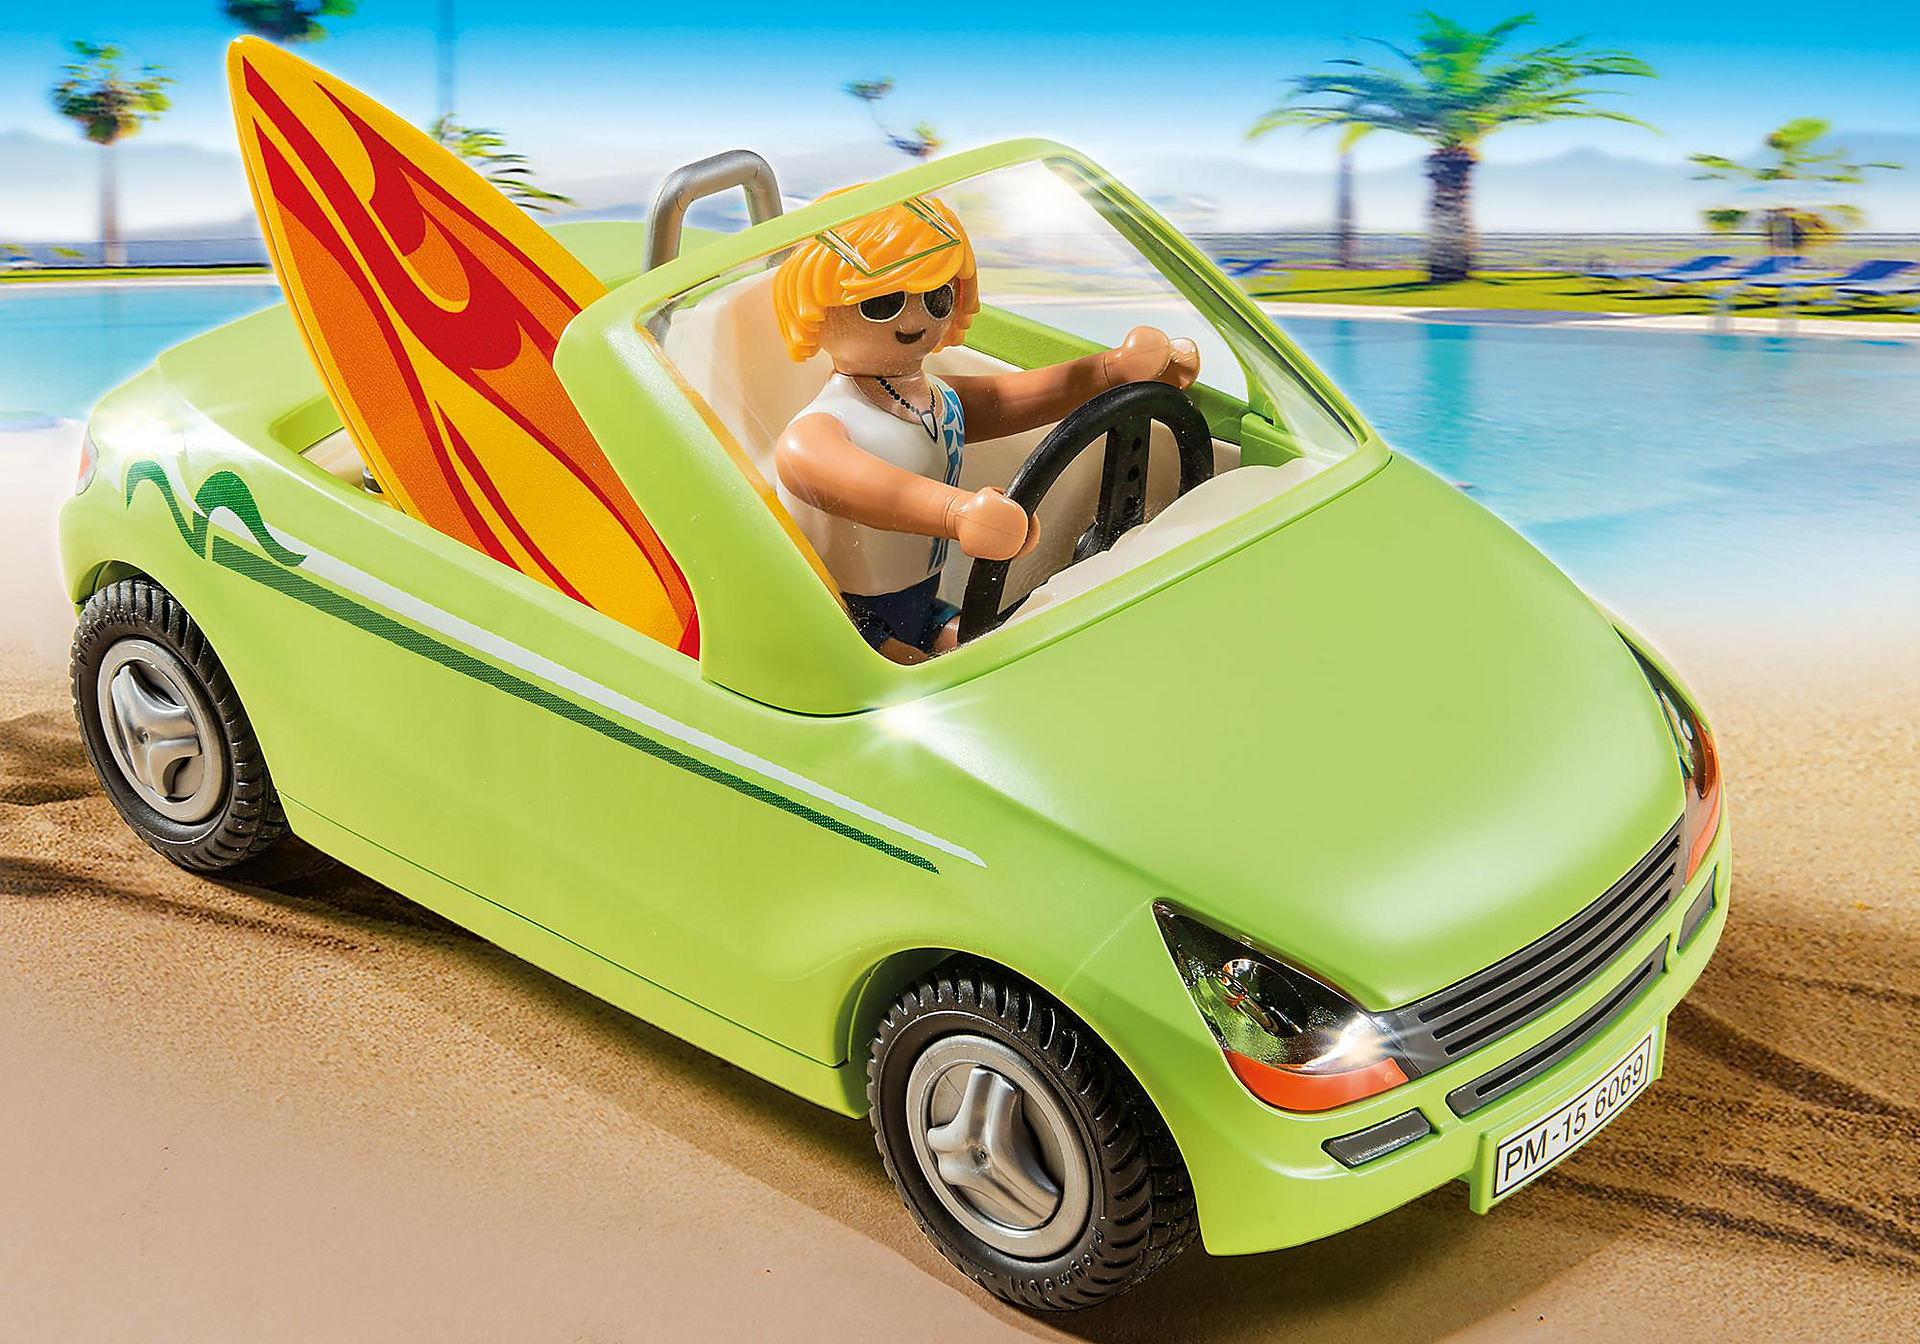 http://media.playmobil.com/i/playmobil/6069_product_extra1/Surf-Roadster